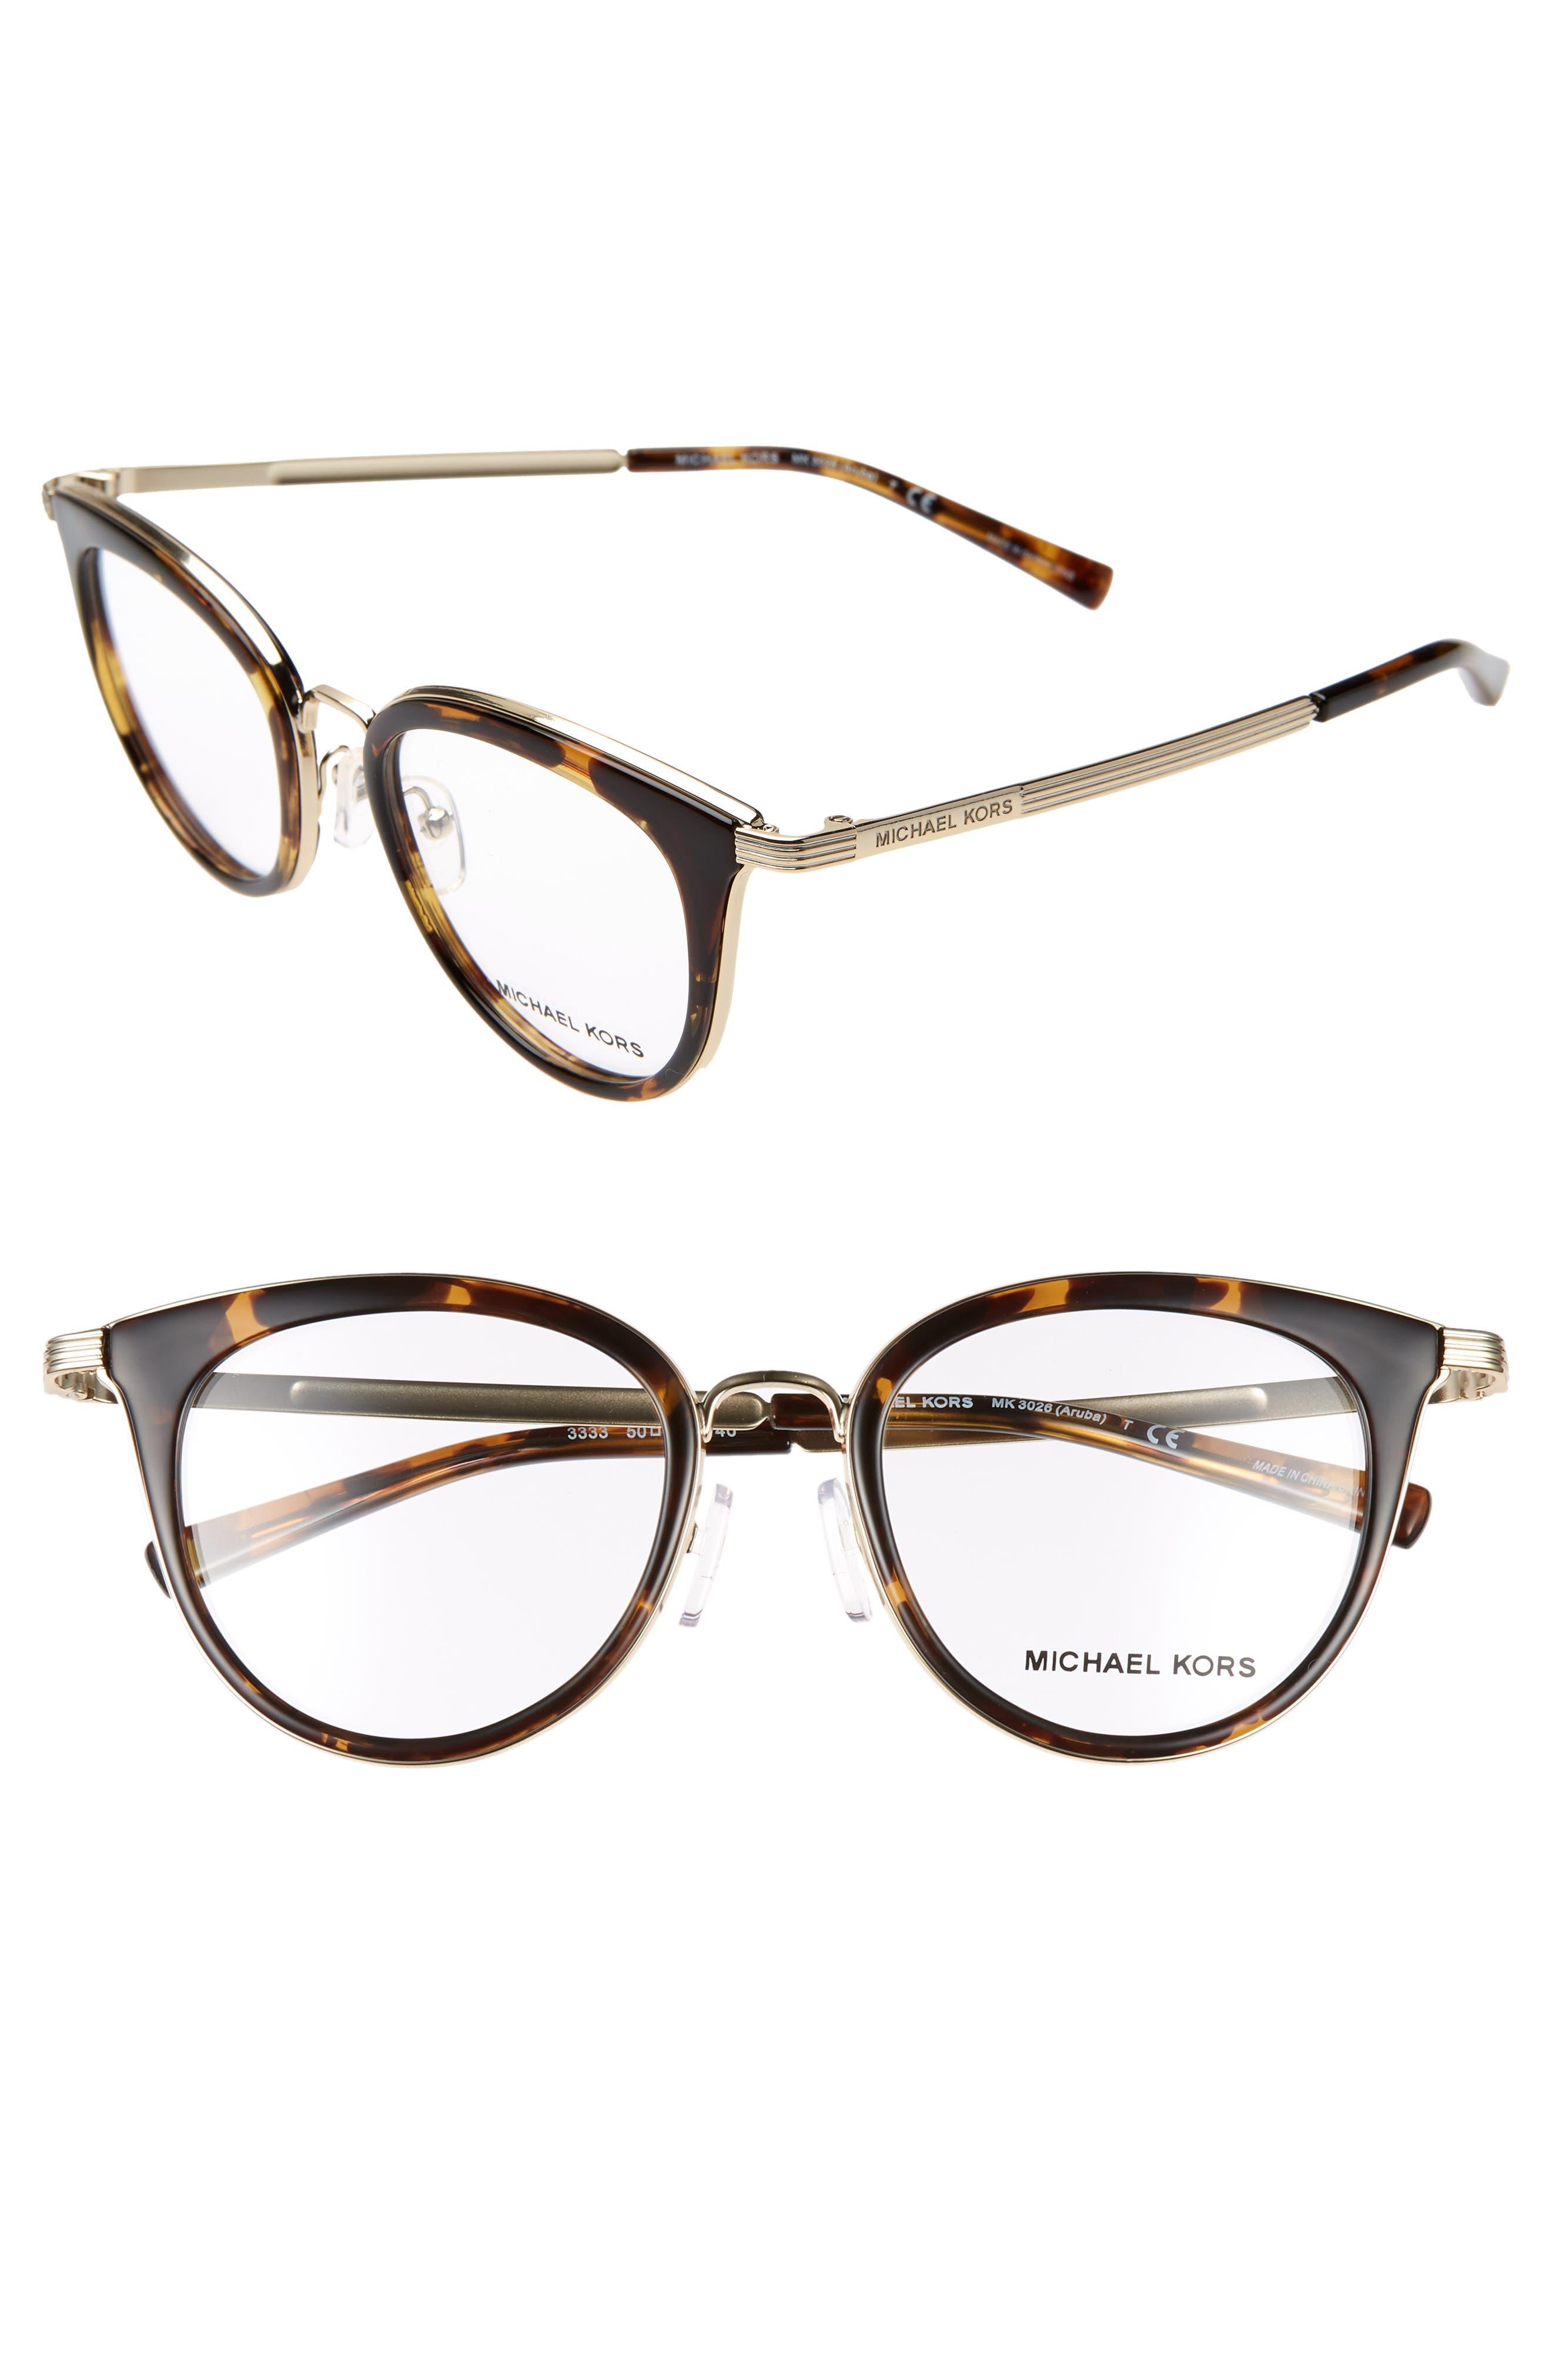 50mm Optical Glasses,                             Main thumbnail 1, color,                             HAVANA/ LITE GOLD